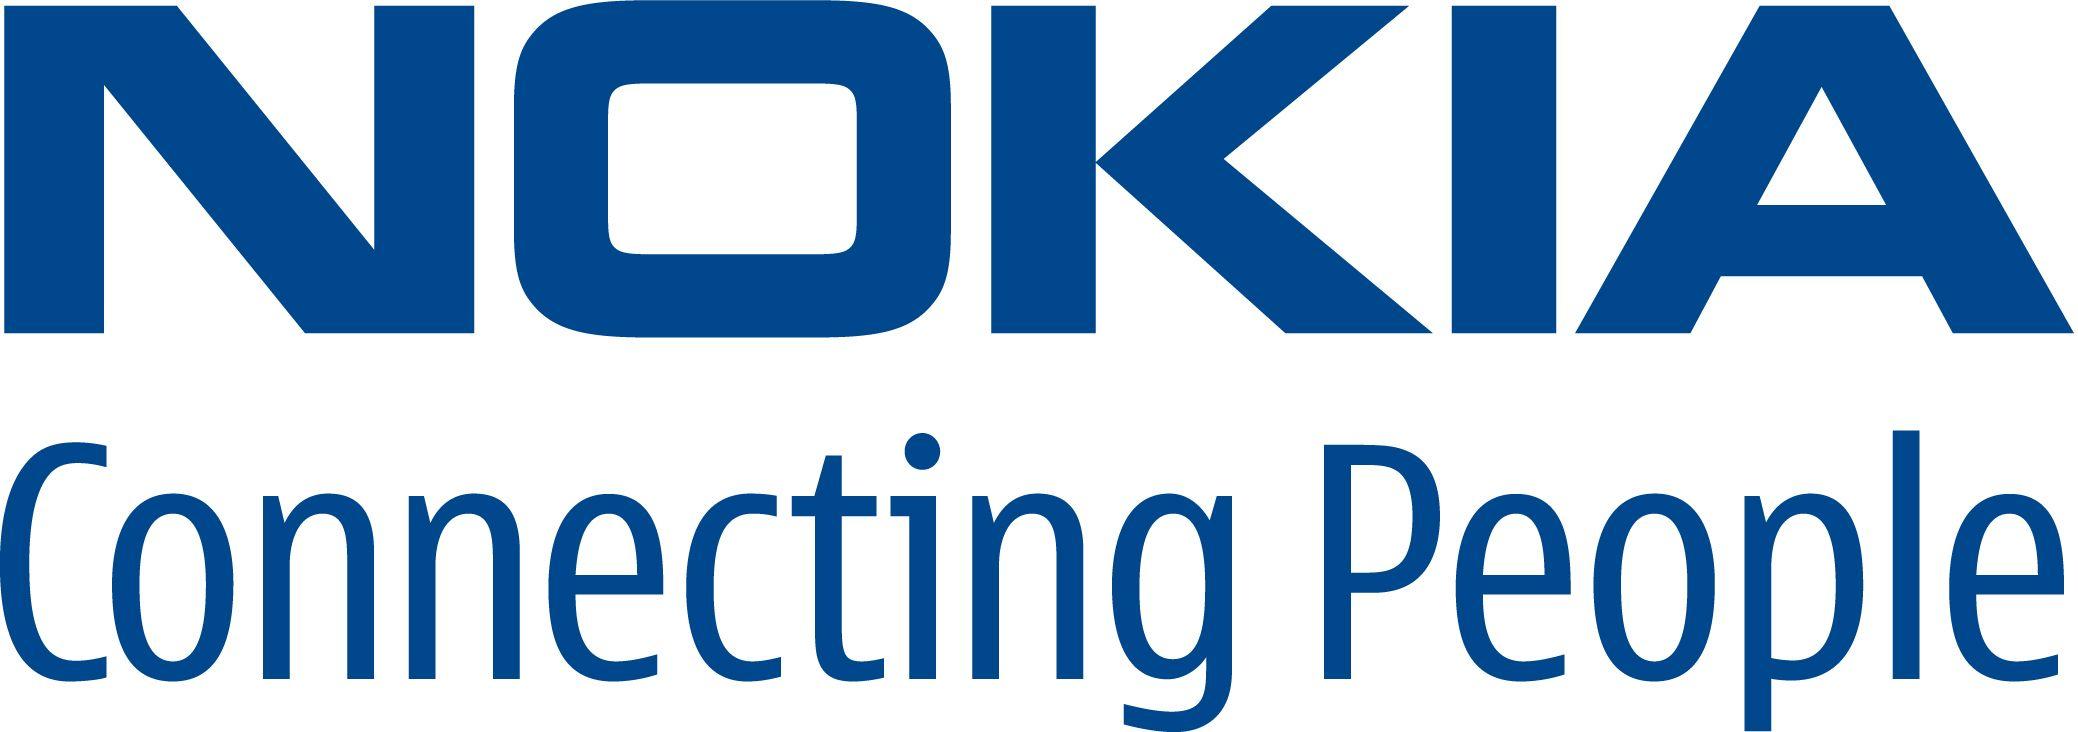 Nokia logo 1.jpg